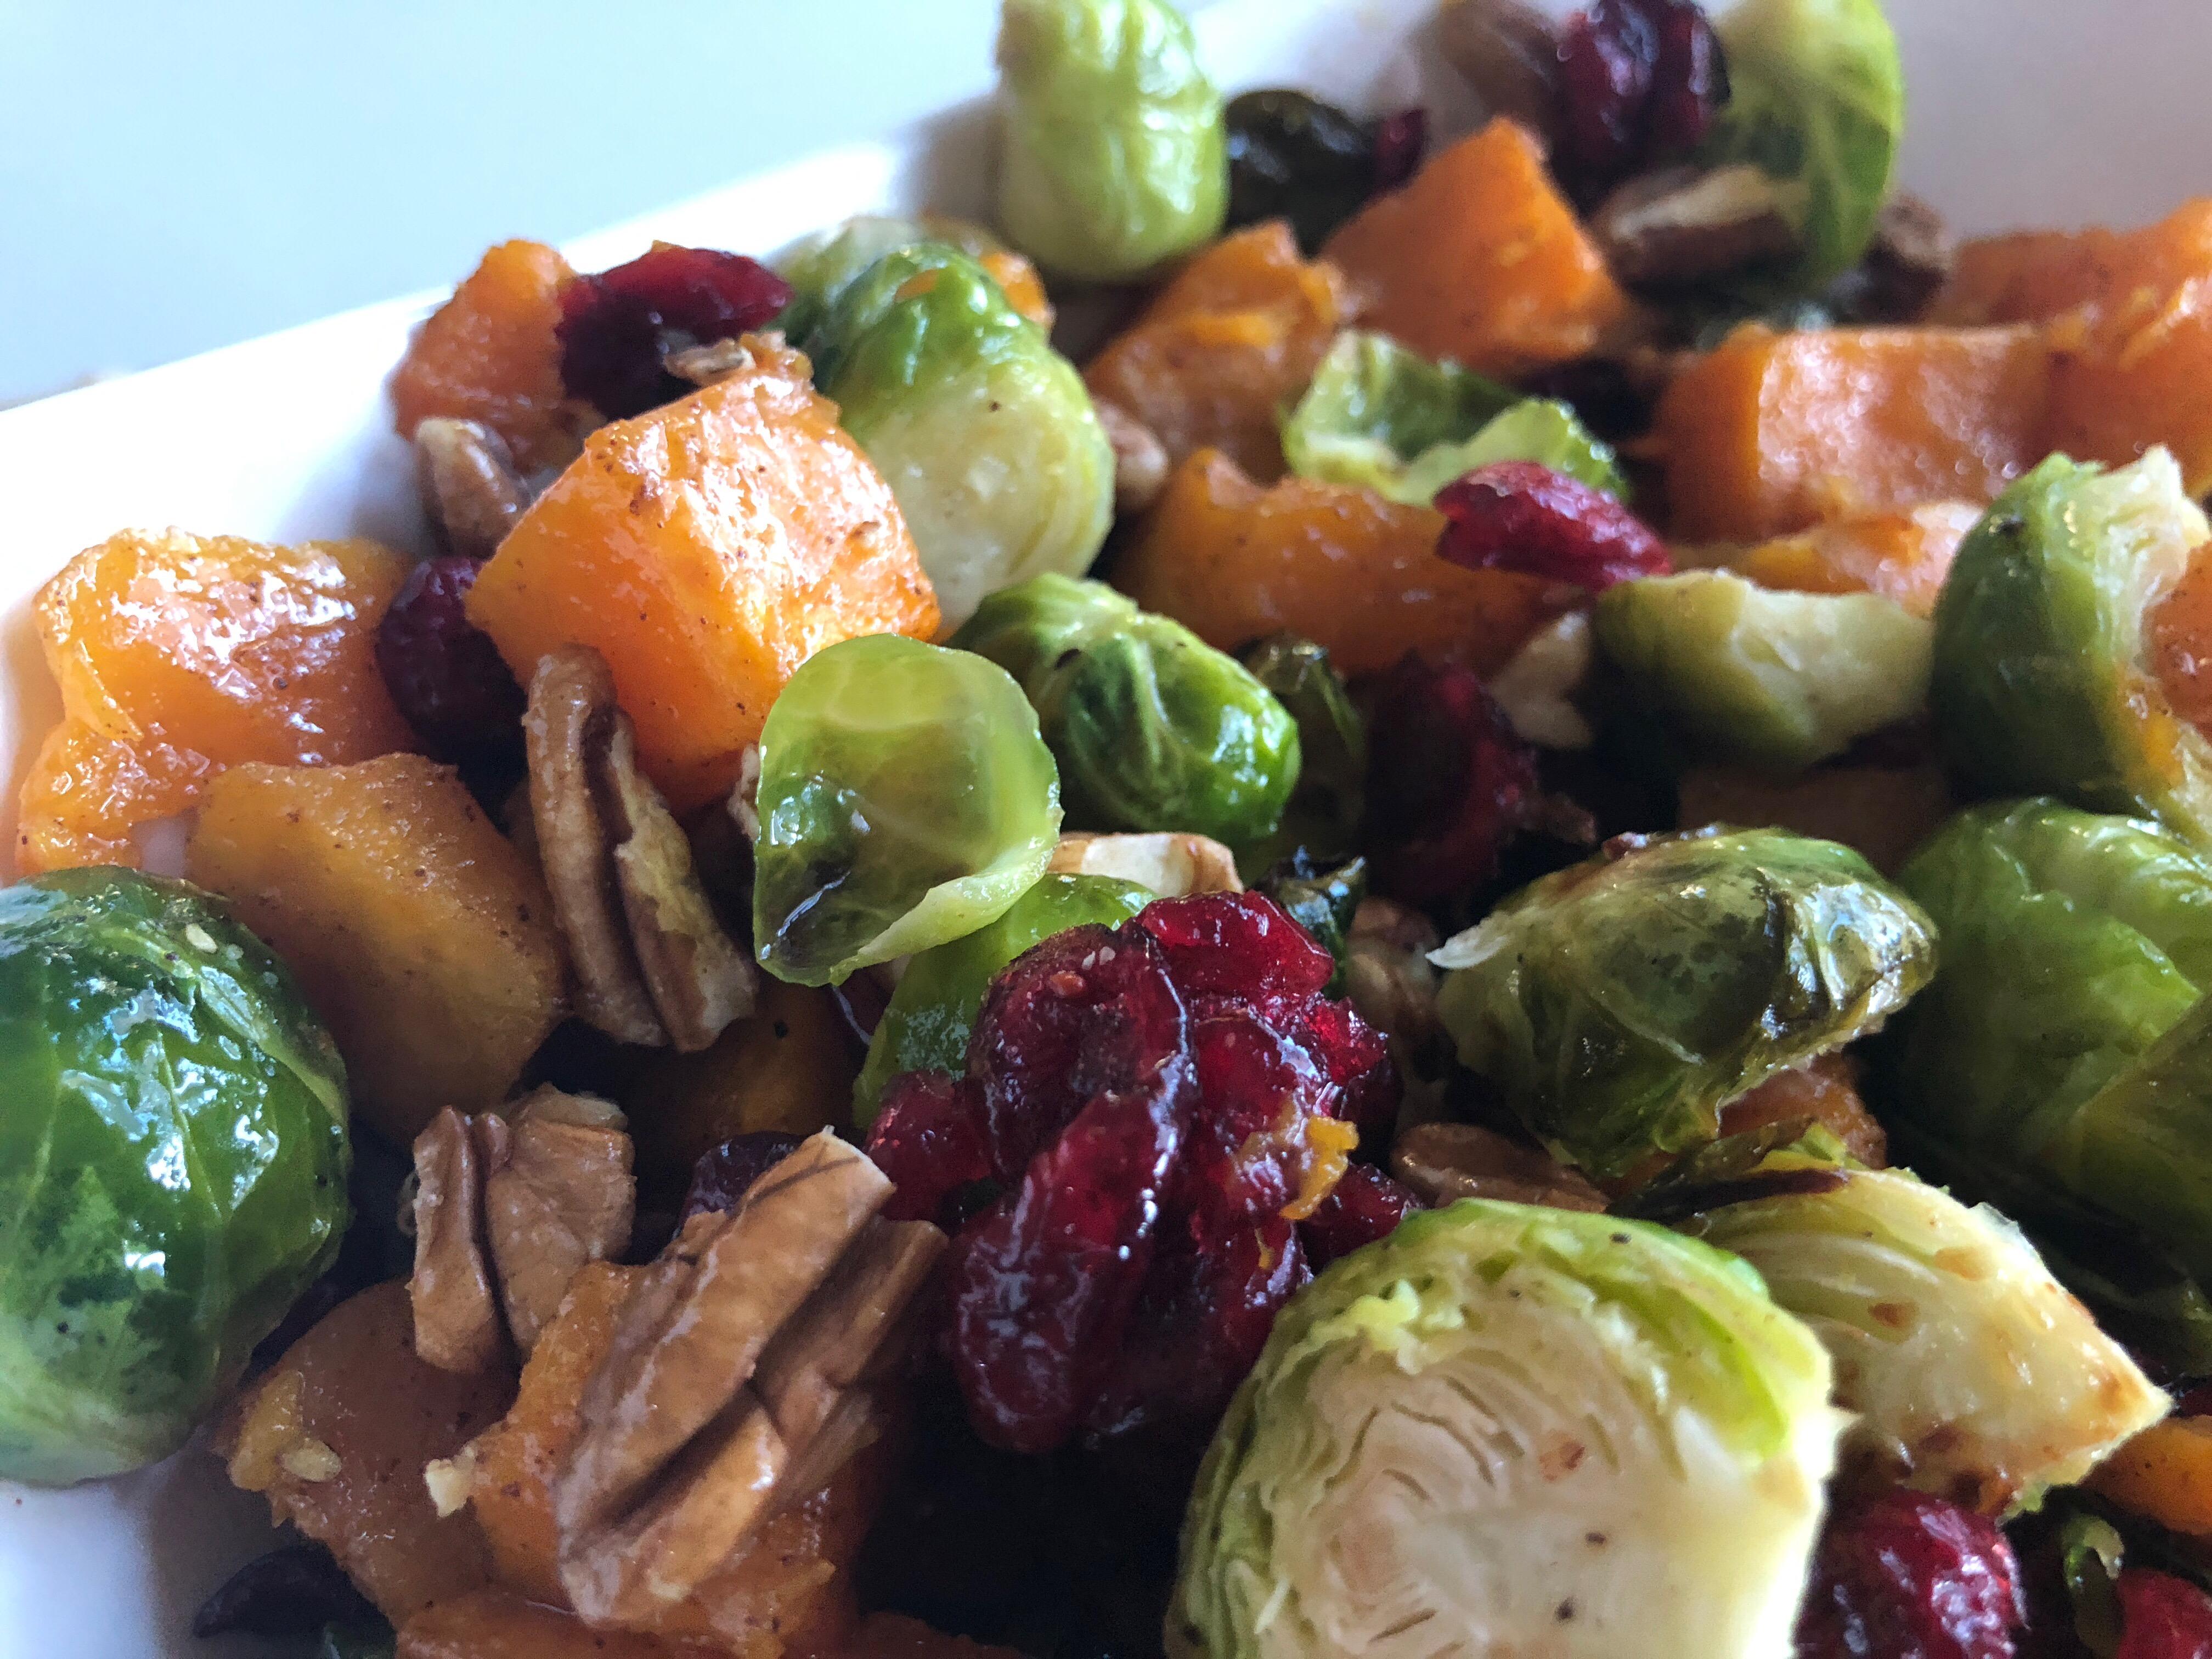 Detail of vegetables